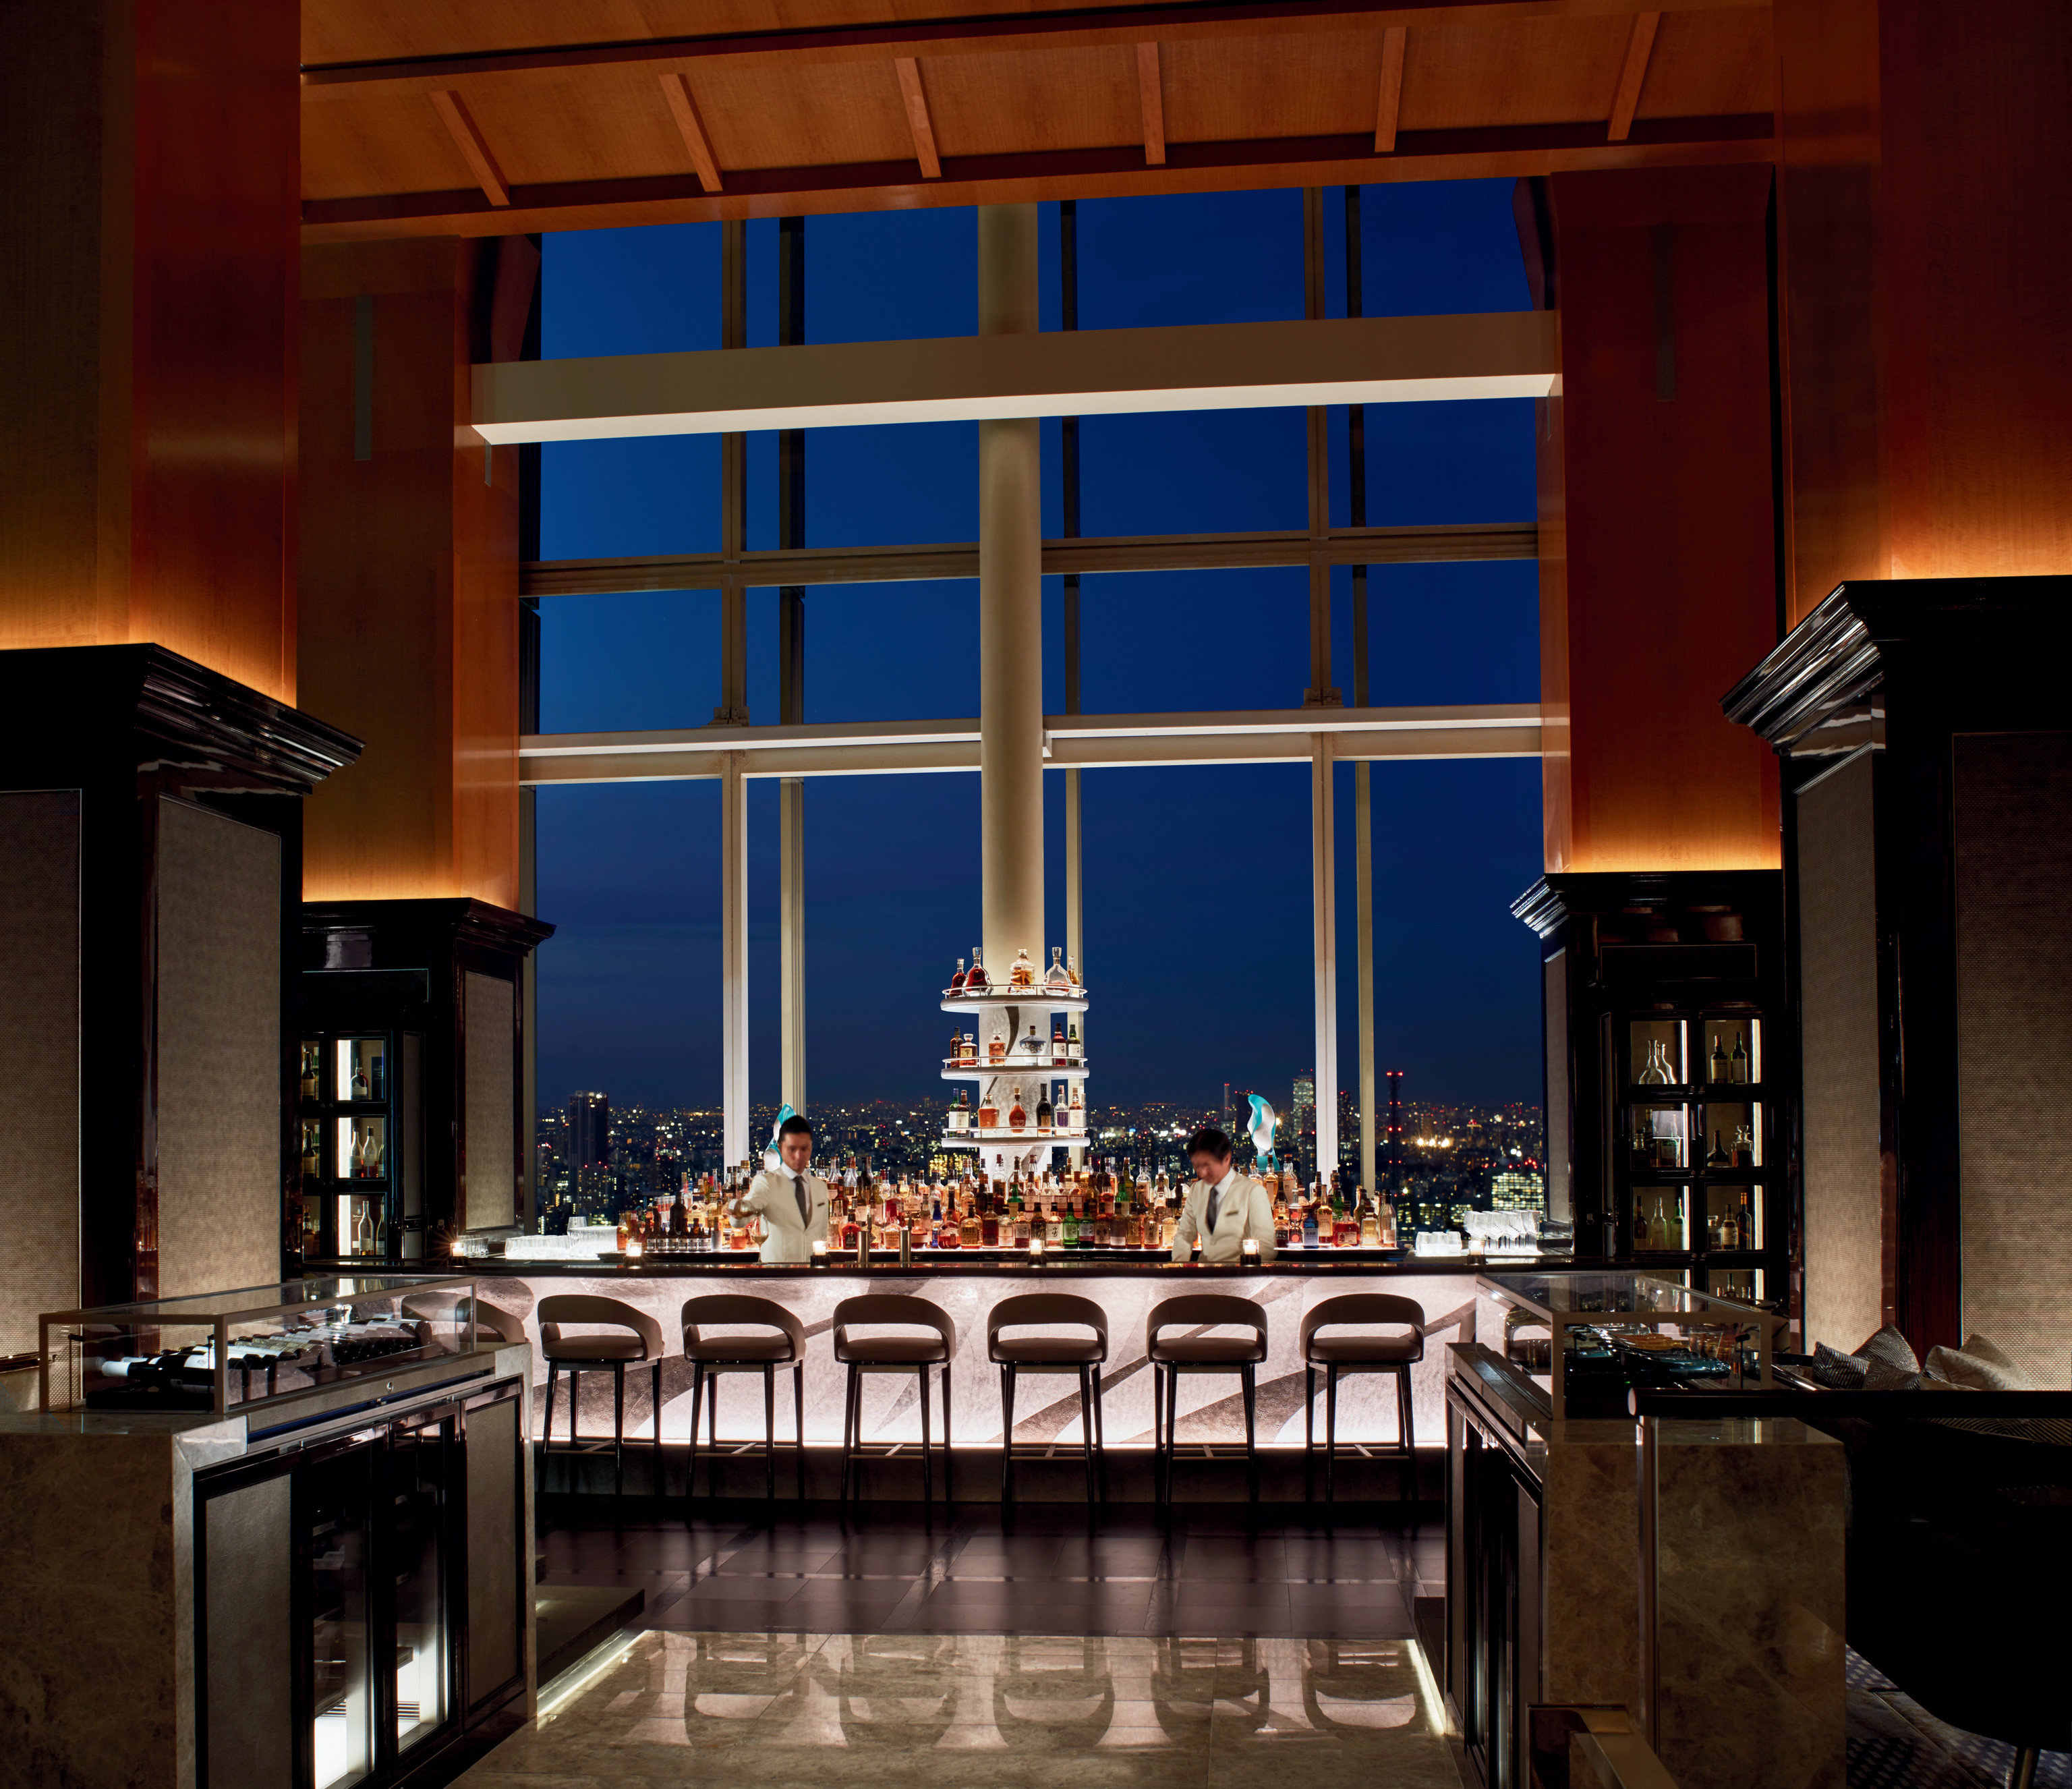 Hotels Japan Tokyo indoor window Architecture interior design estate lighting home Lobby Bar Island